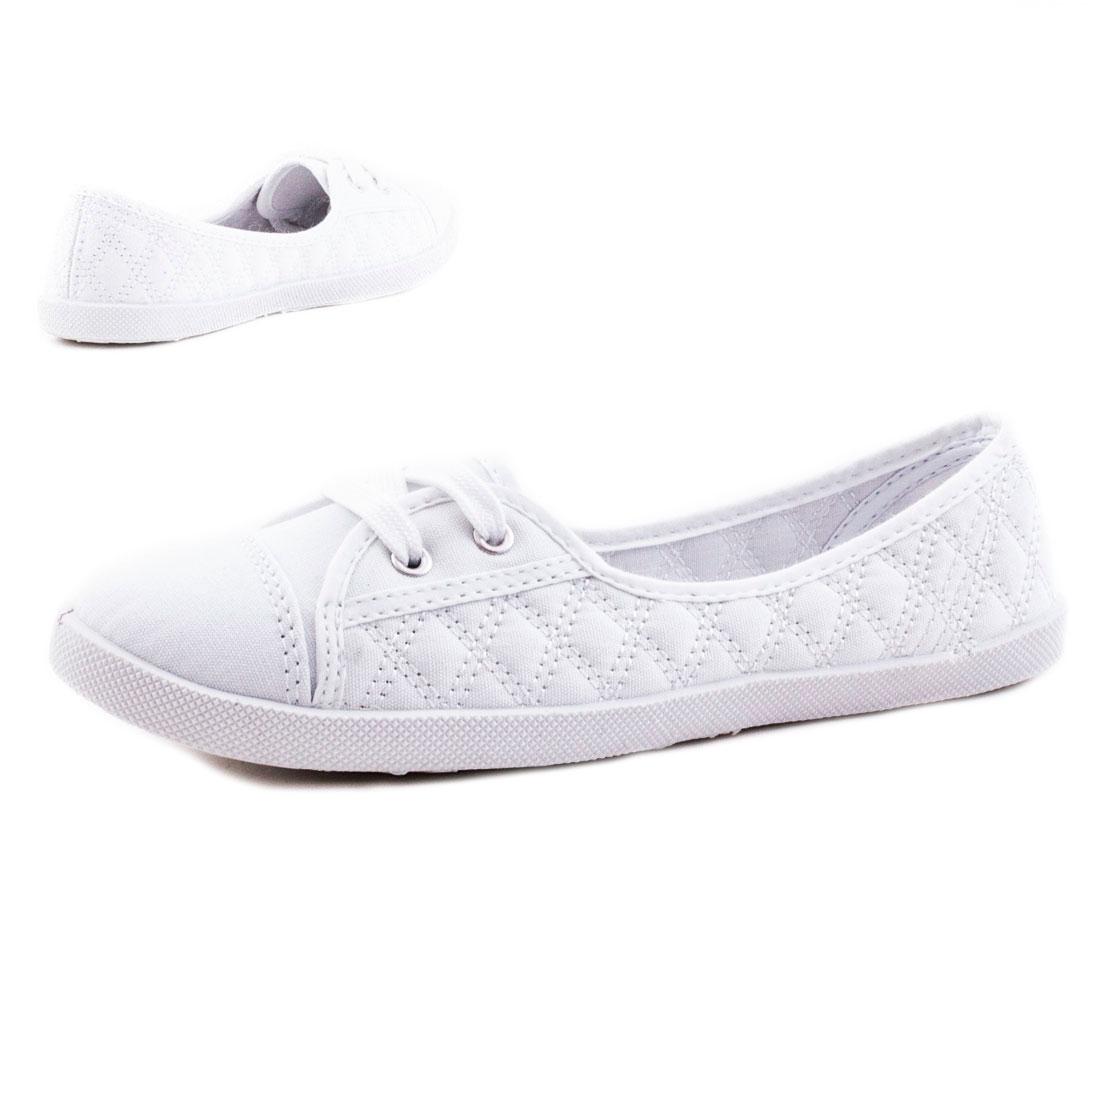 neu damen flache sommer sneaker schn r ballerinas textil gr 36 37 38 39 40 41 ebay. Black Bedroom Furniture Sets. Home Design Ideas